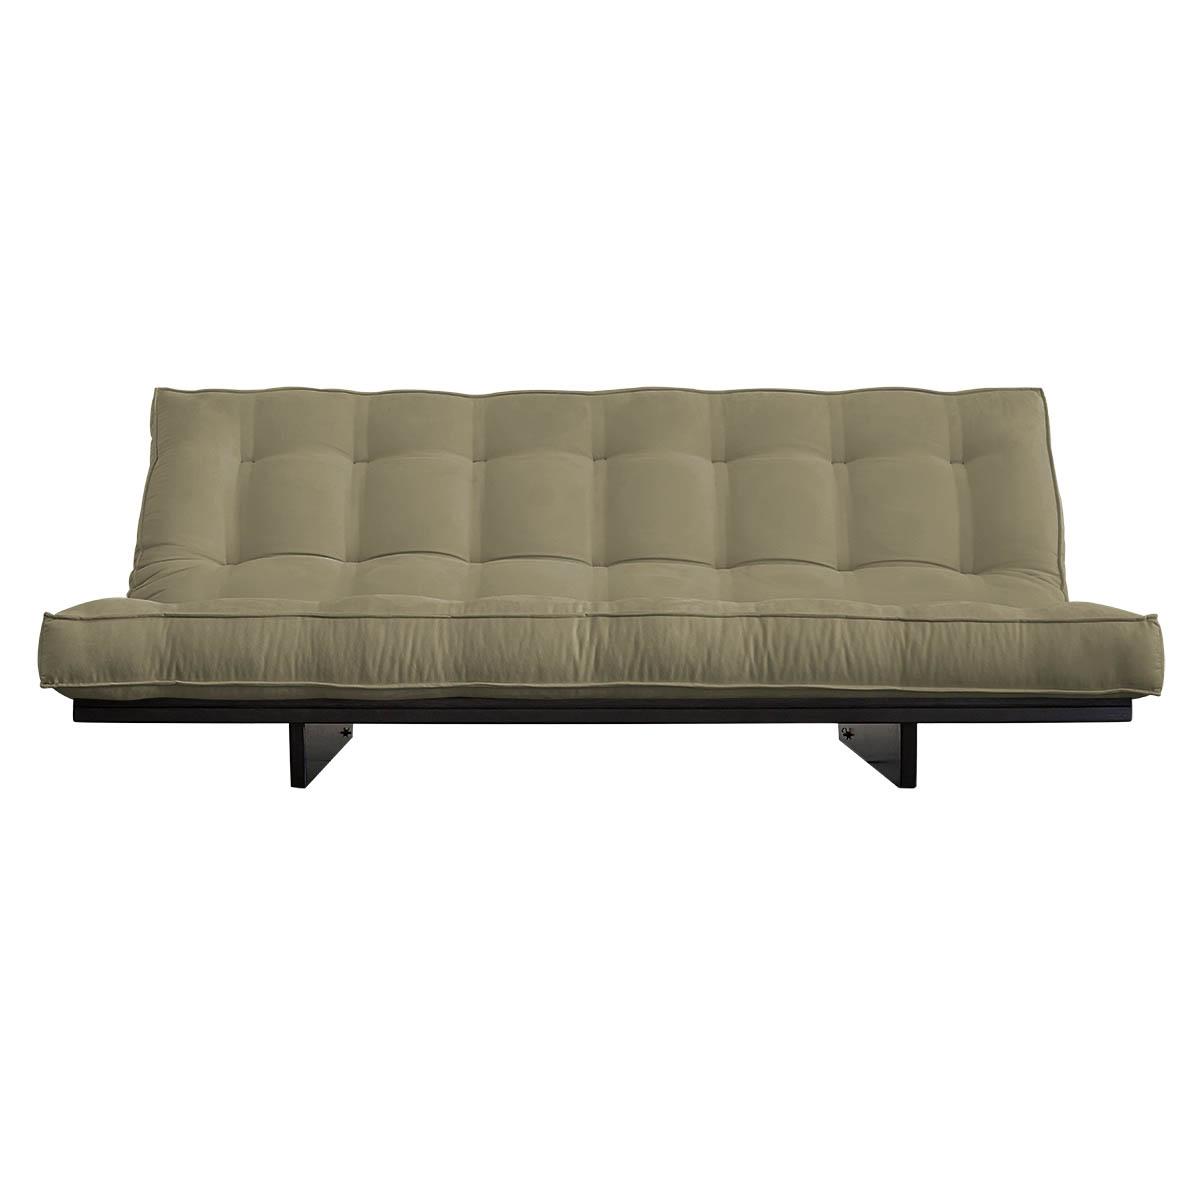 sofa cama walmart brasil 5 in 1 bed buy online simples  futon company